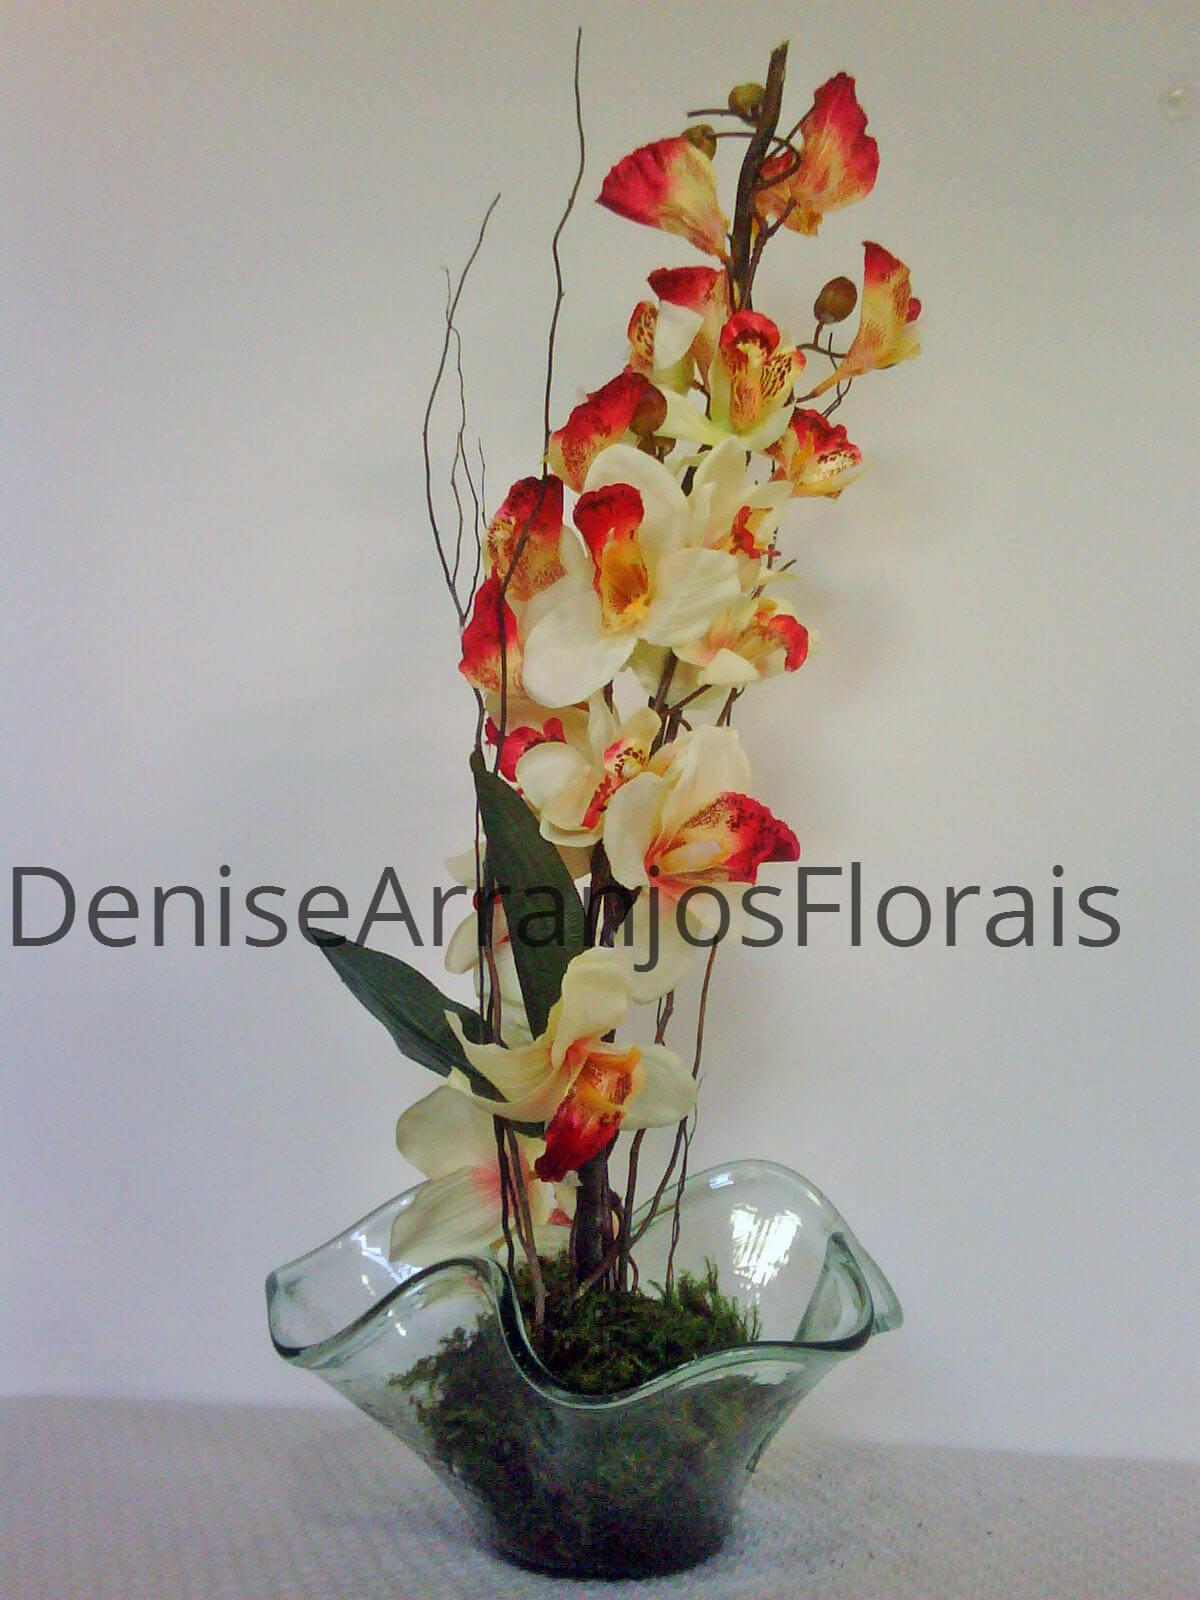 Arranjos De Flores Artificiais Grandes   Denise Arranjos Florais